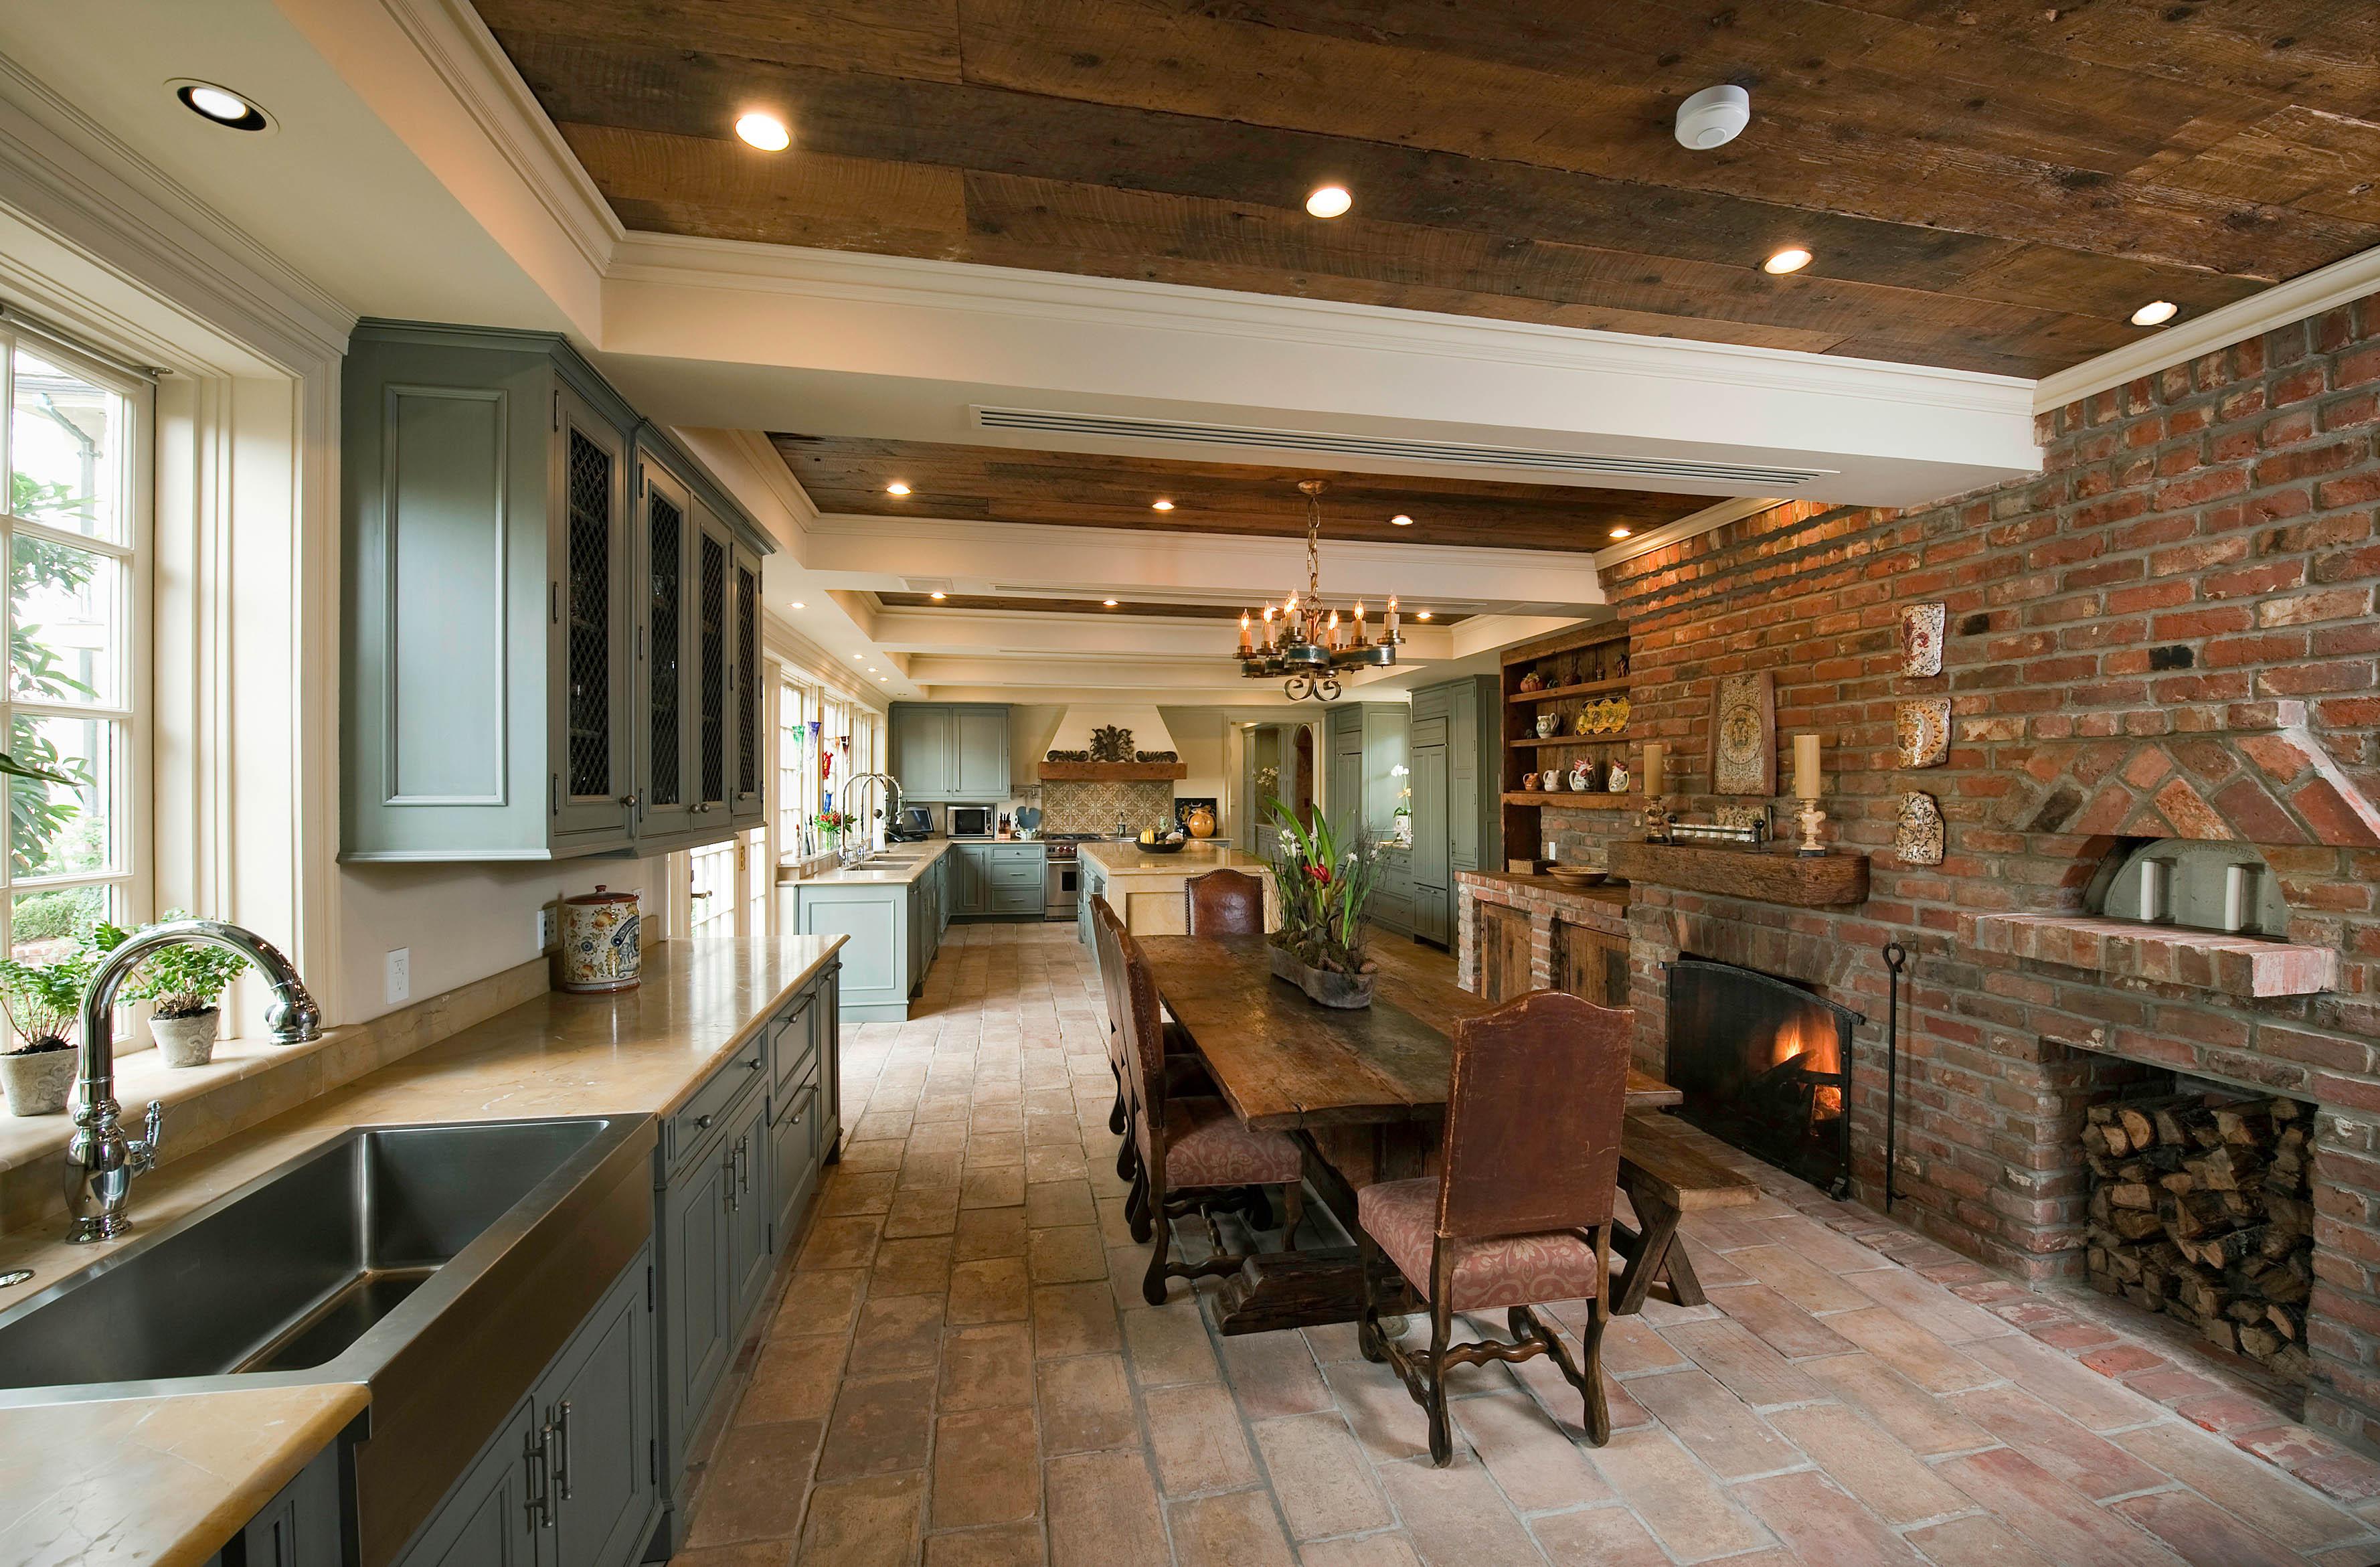 Old Metairie Kitchen_8753 114